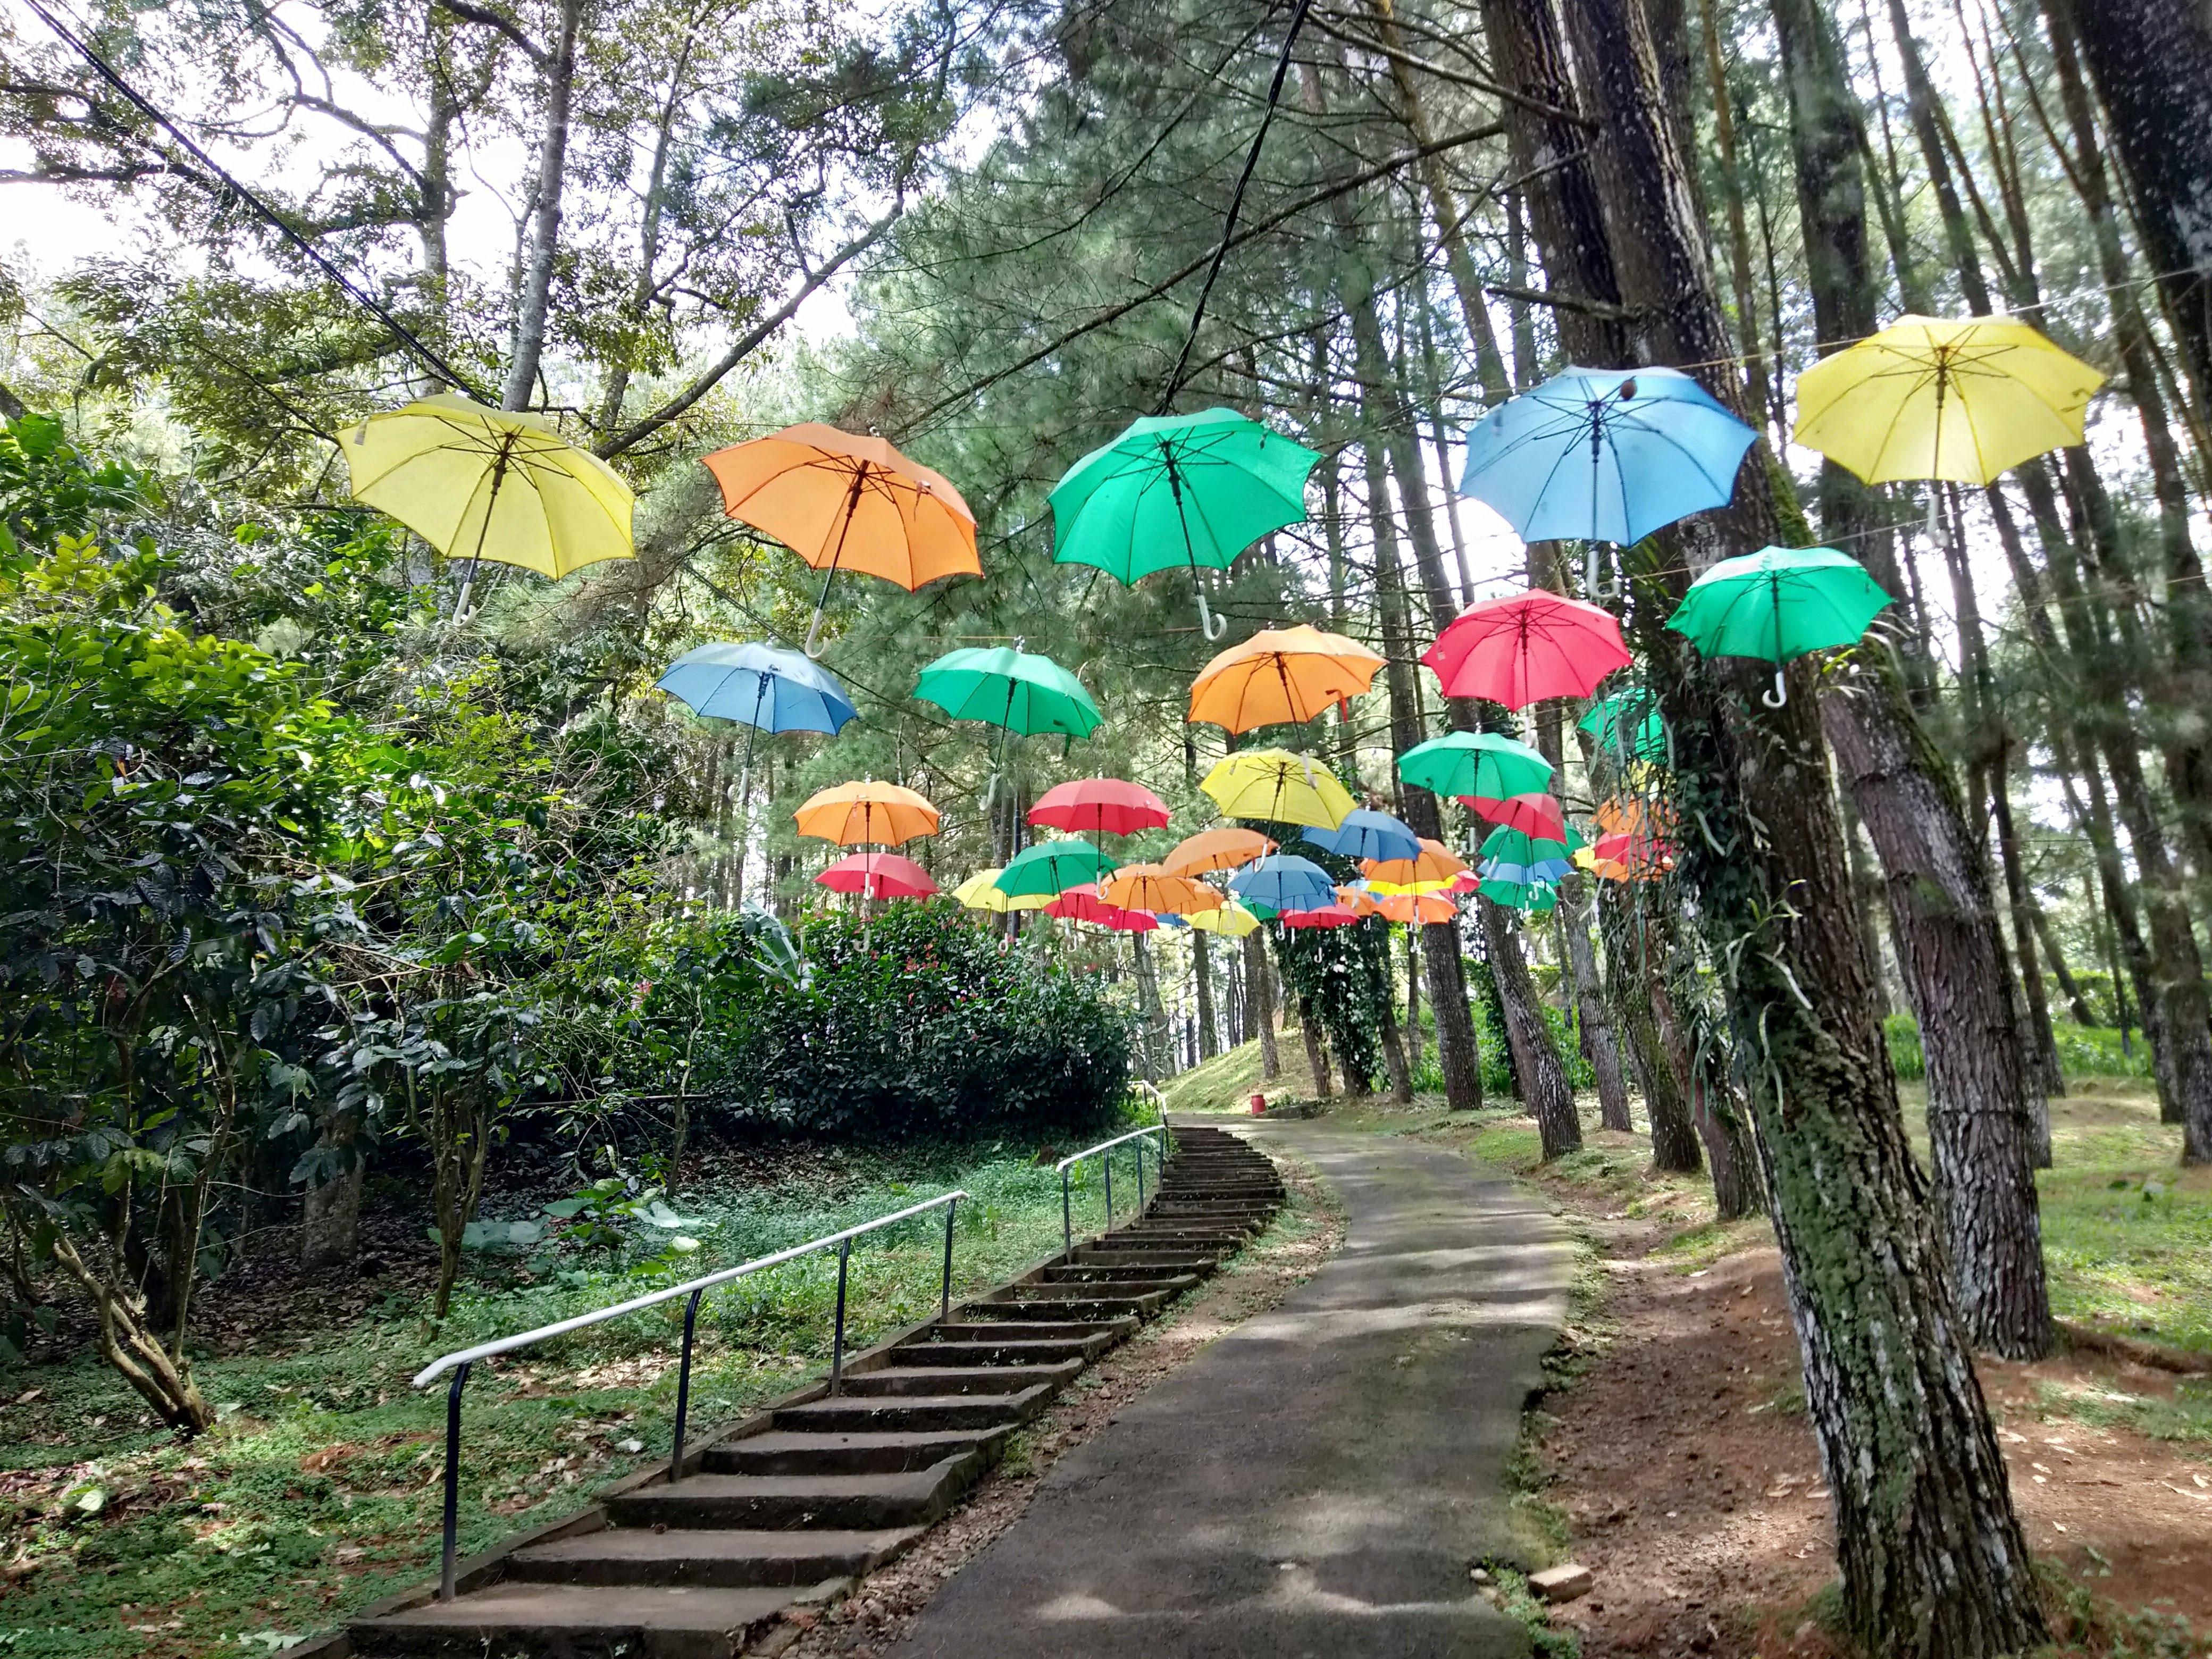 7 Tempat Wisata Di Sukabumi Paling Hits & Instagramable ...